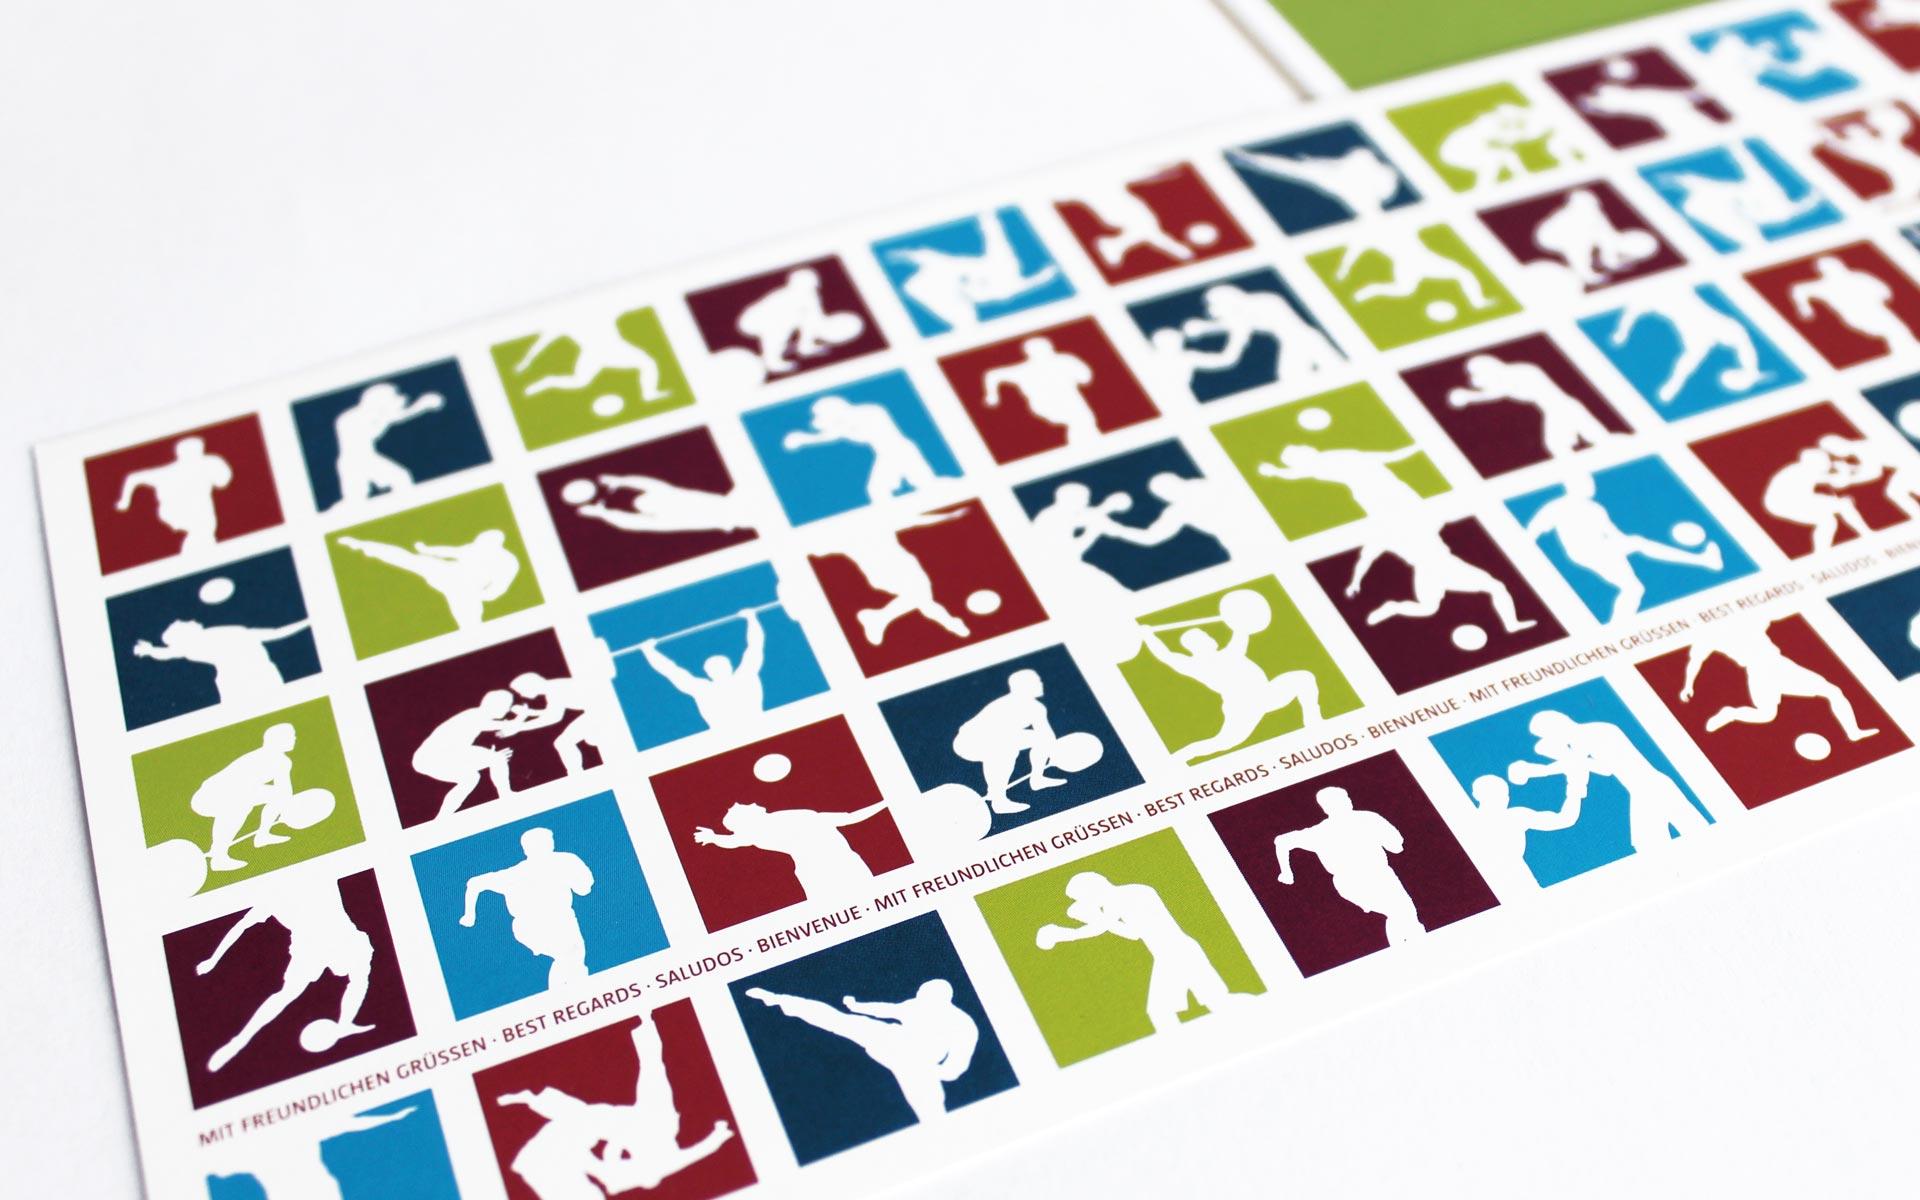 Sportschule Hennef Corporate Design, Logotype, Bildmarken-Varianten